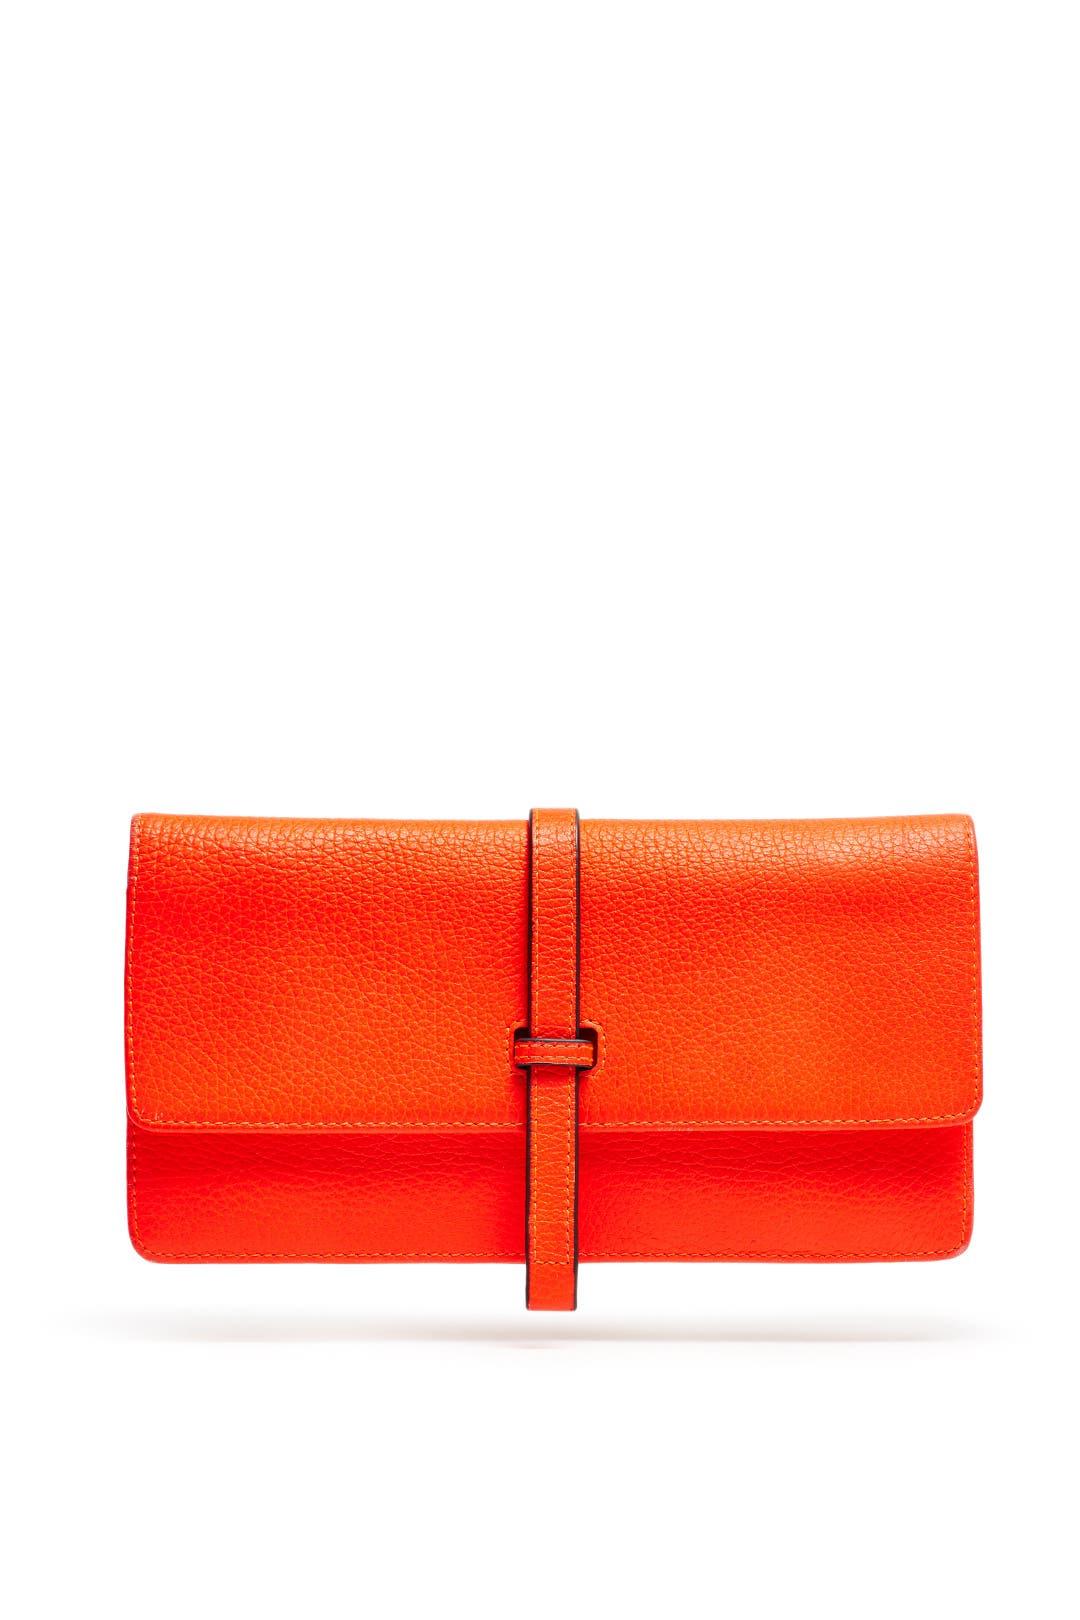 Tangerine Leyla Clutch by Annabel Ingall